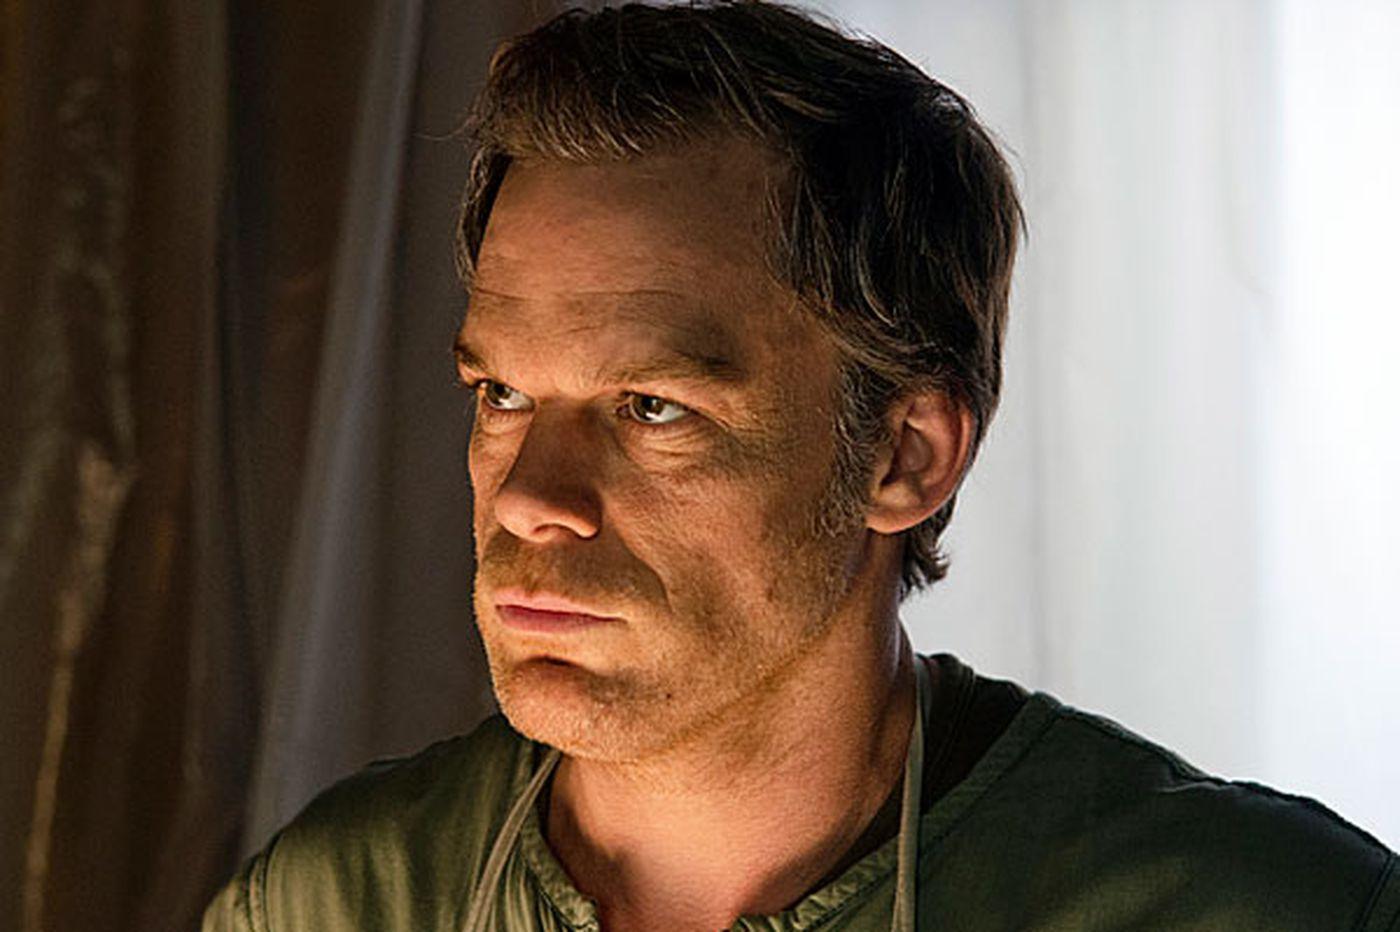 Ellen Gray: After 7 seasons, 'Dexter' still humanizes inhumanity